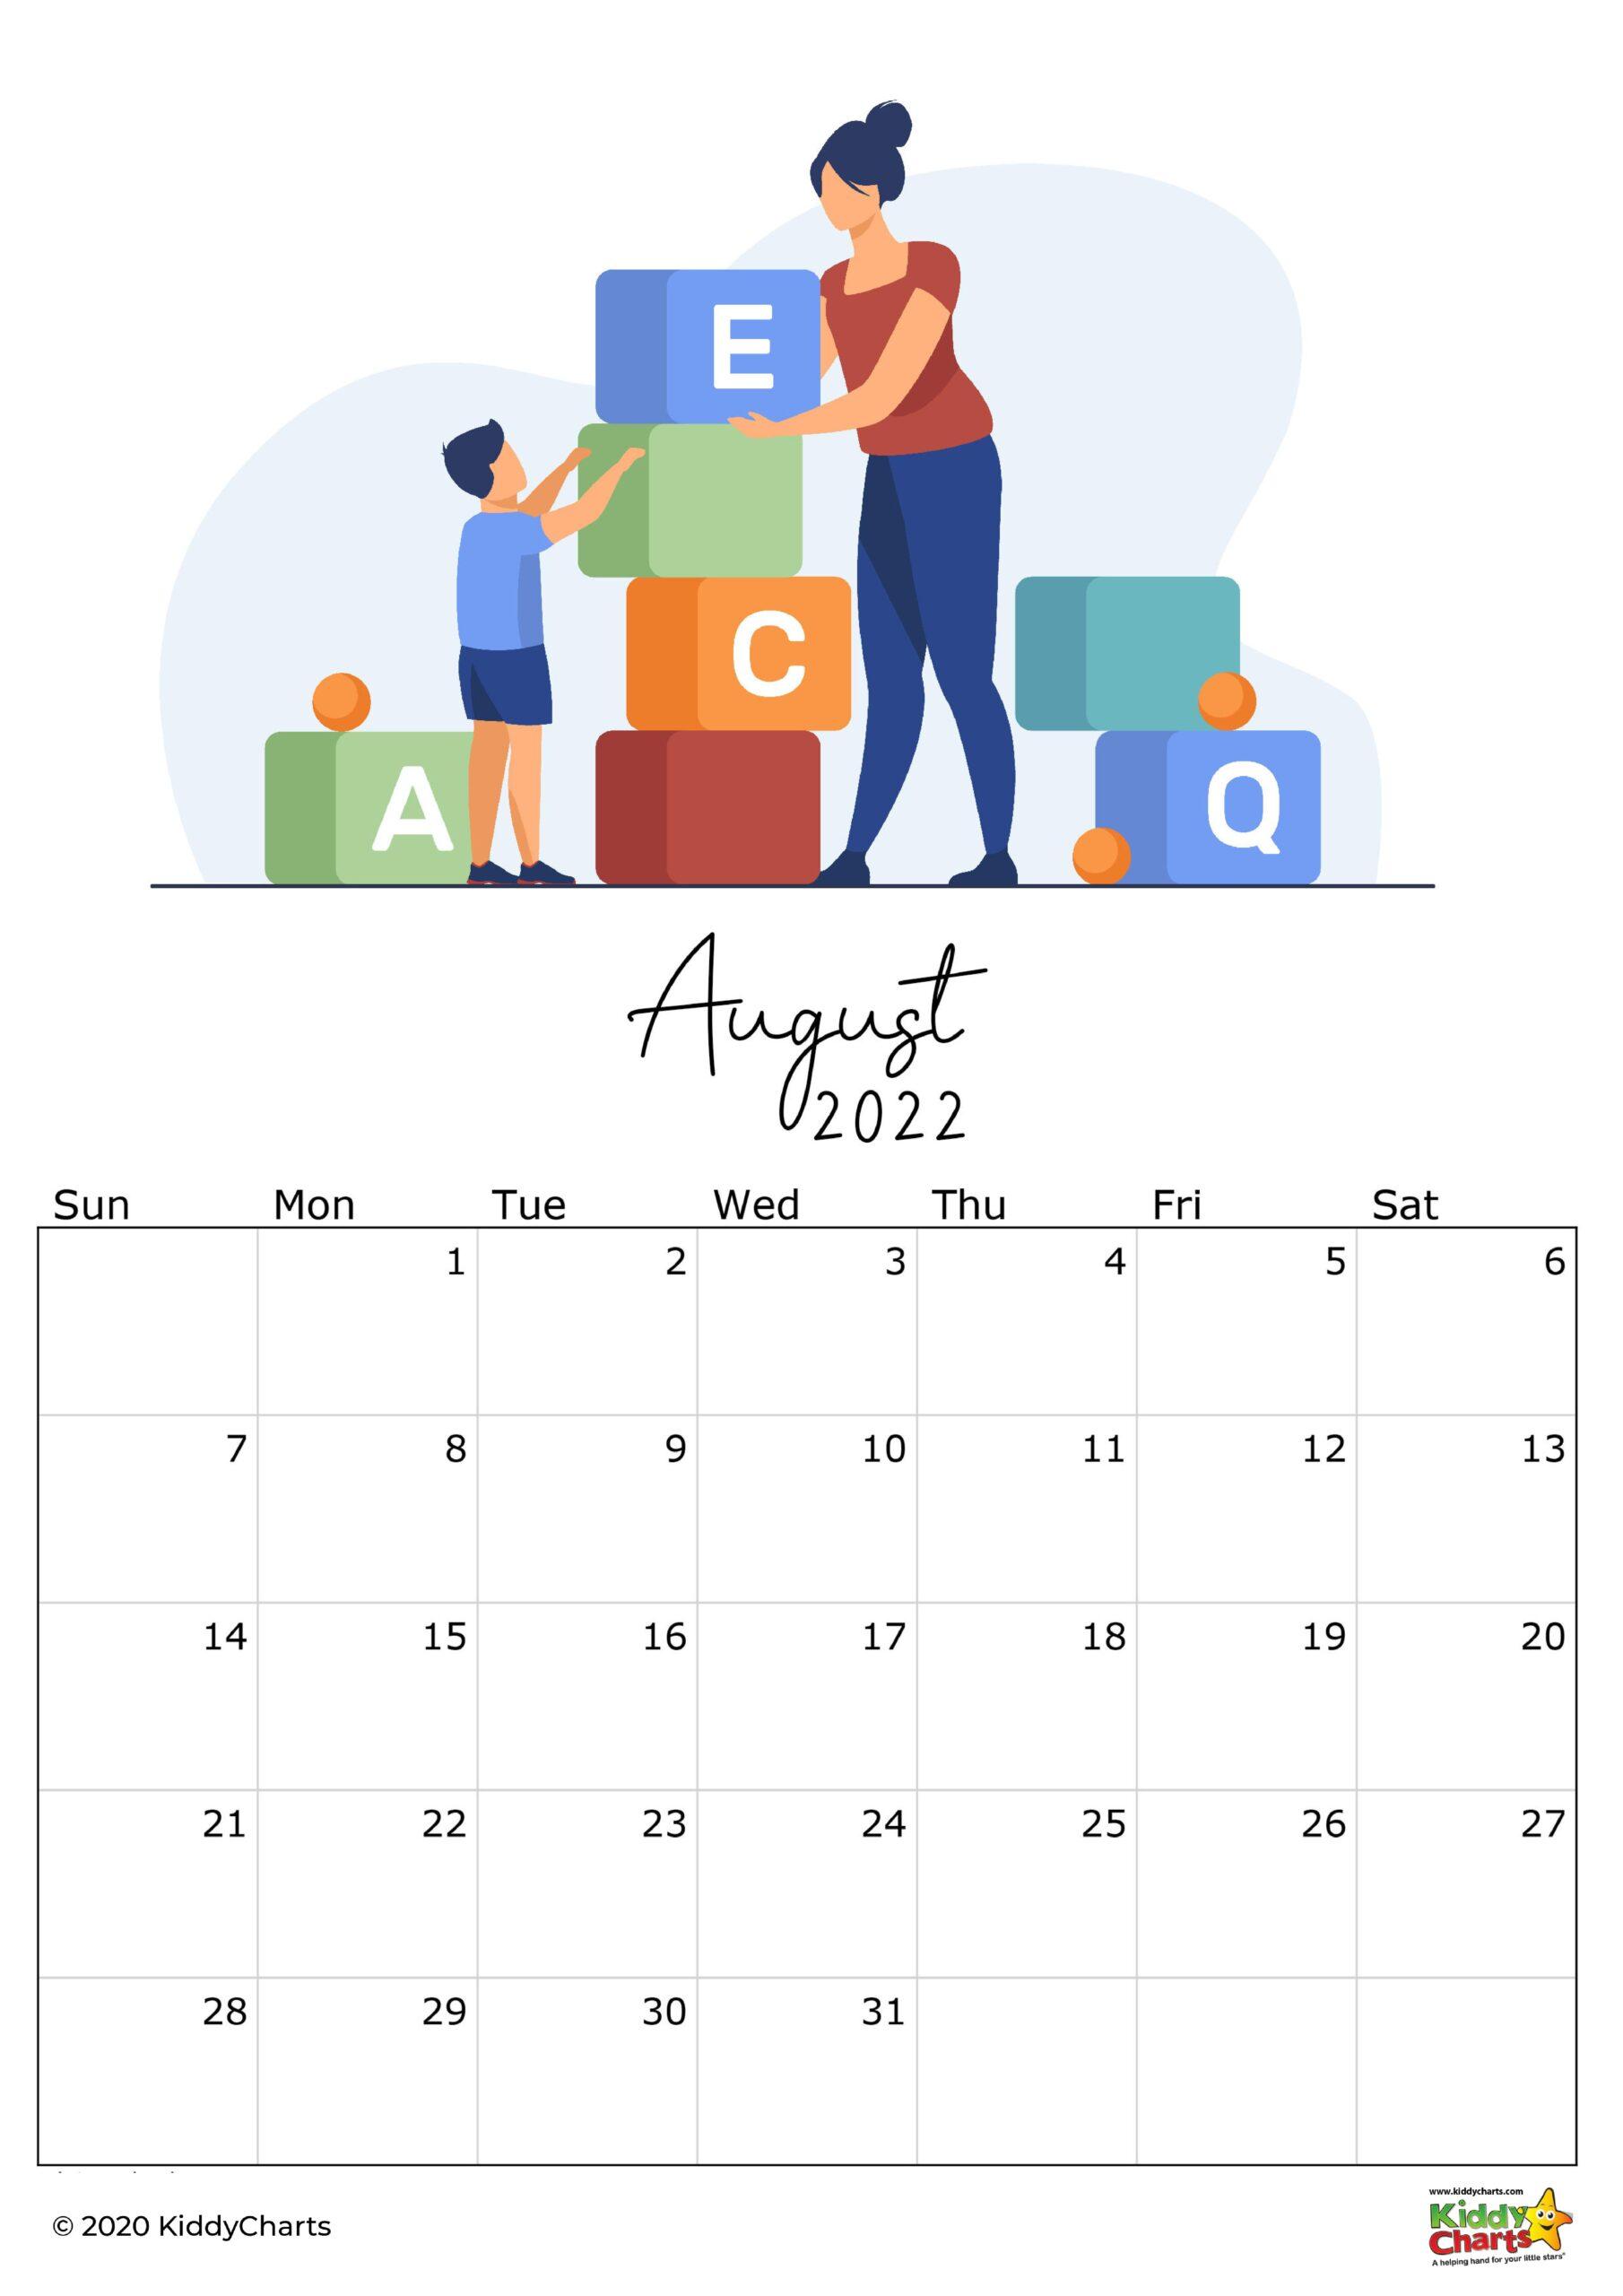 2022 Summer Calendar.2022 Calendar Thats Printable Kids Monthly Snapshots Kiddycharts Com